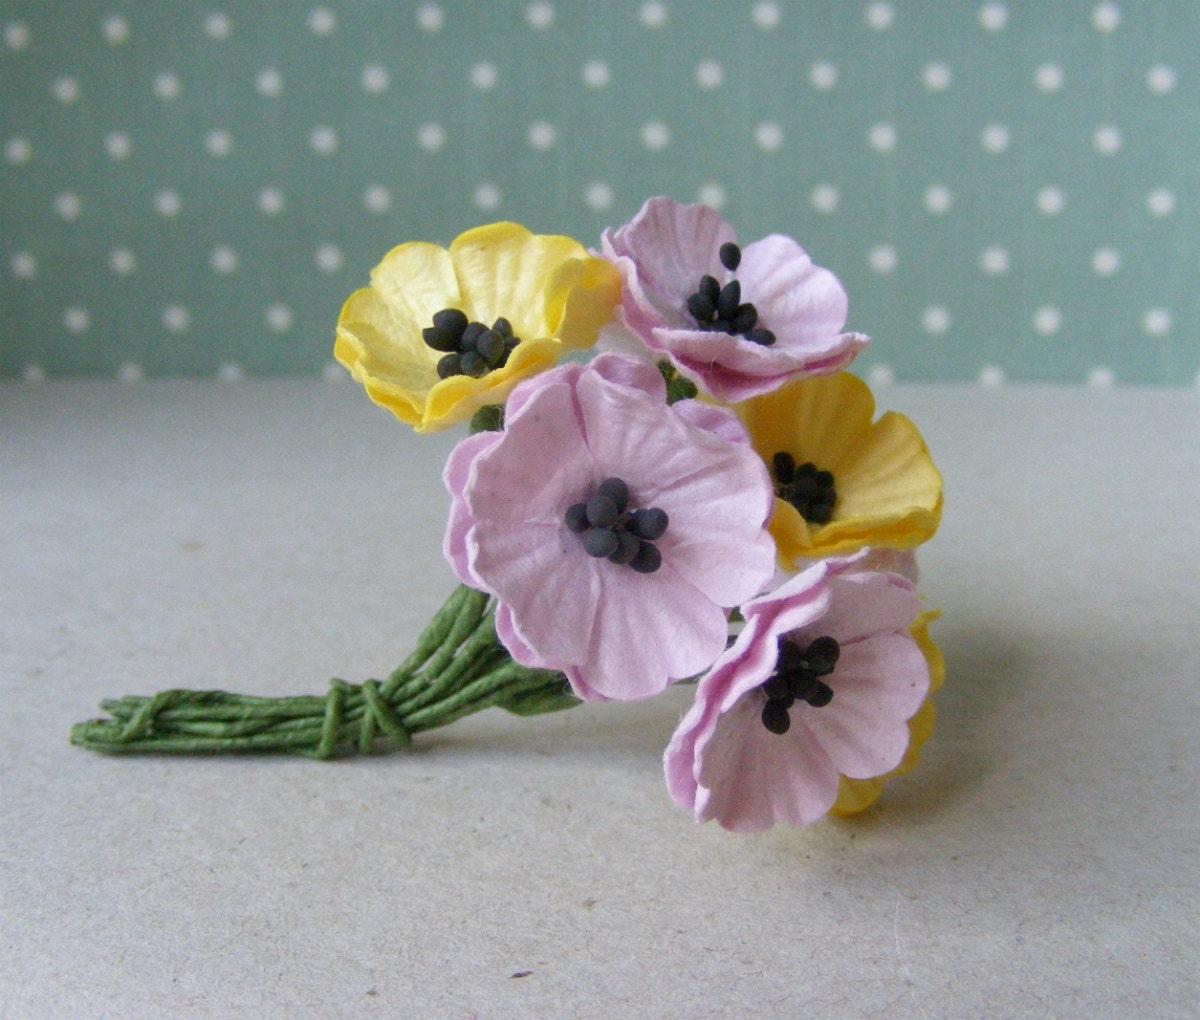 How to scrapbook like poppy - Sold By Bythita